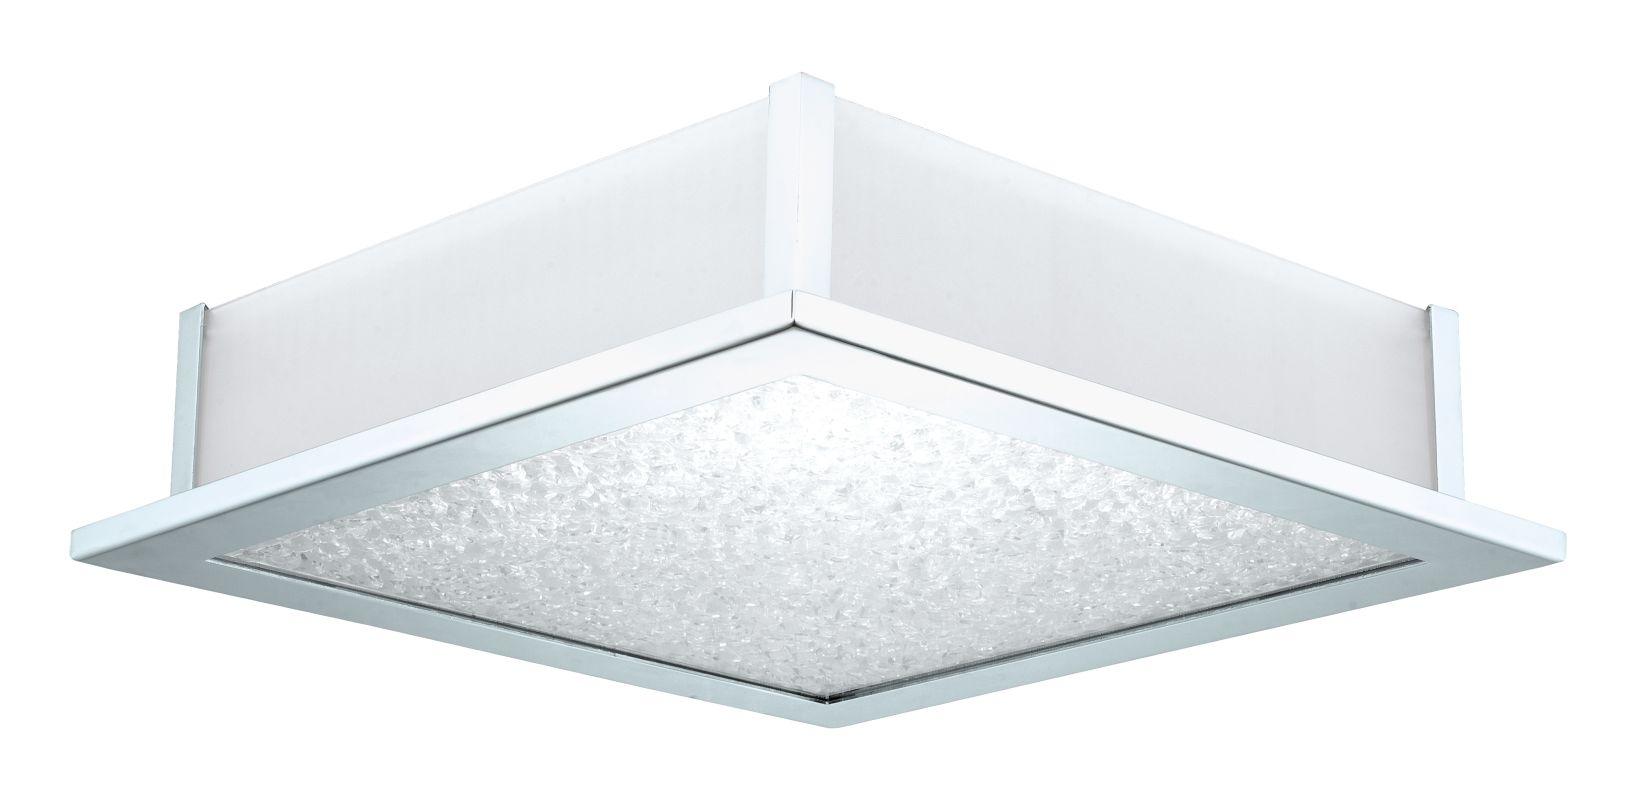 Eglo 92714 Auriga Crystal 5 Light Flush Mount Ceiling Fixture Chrome